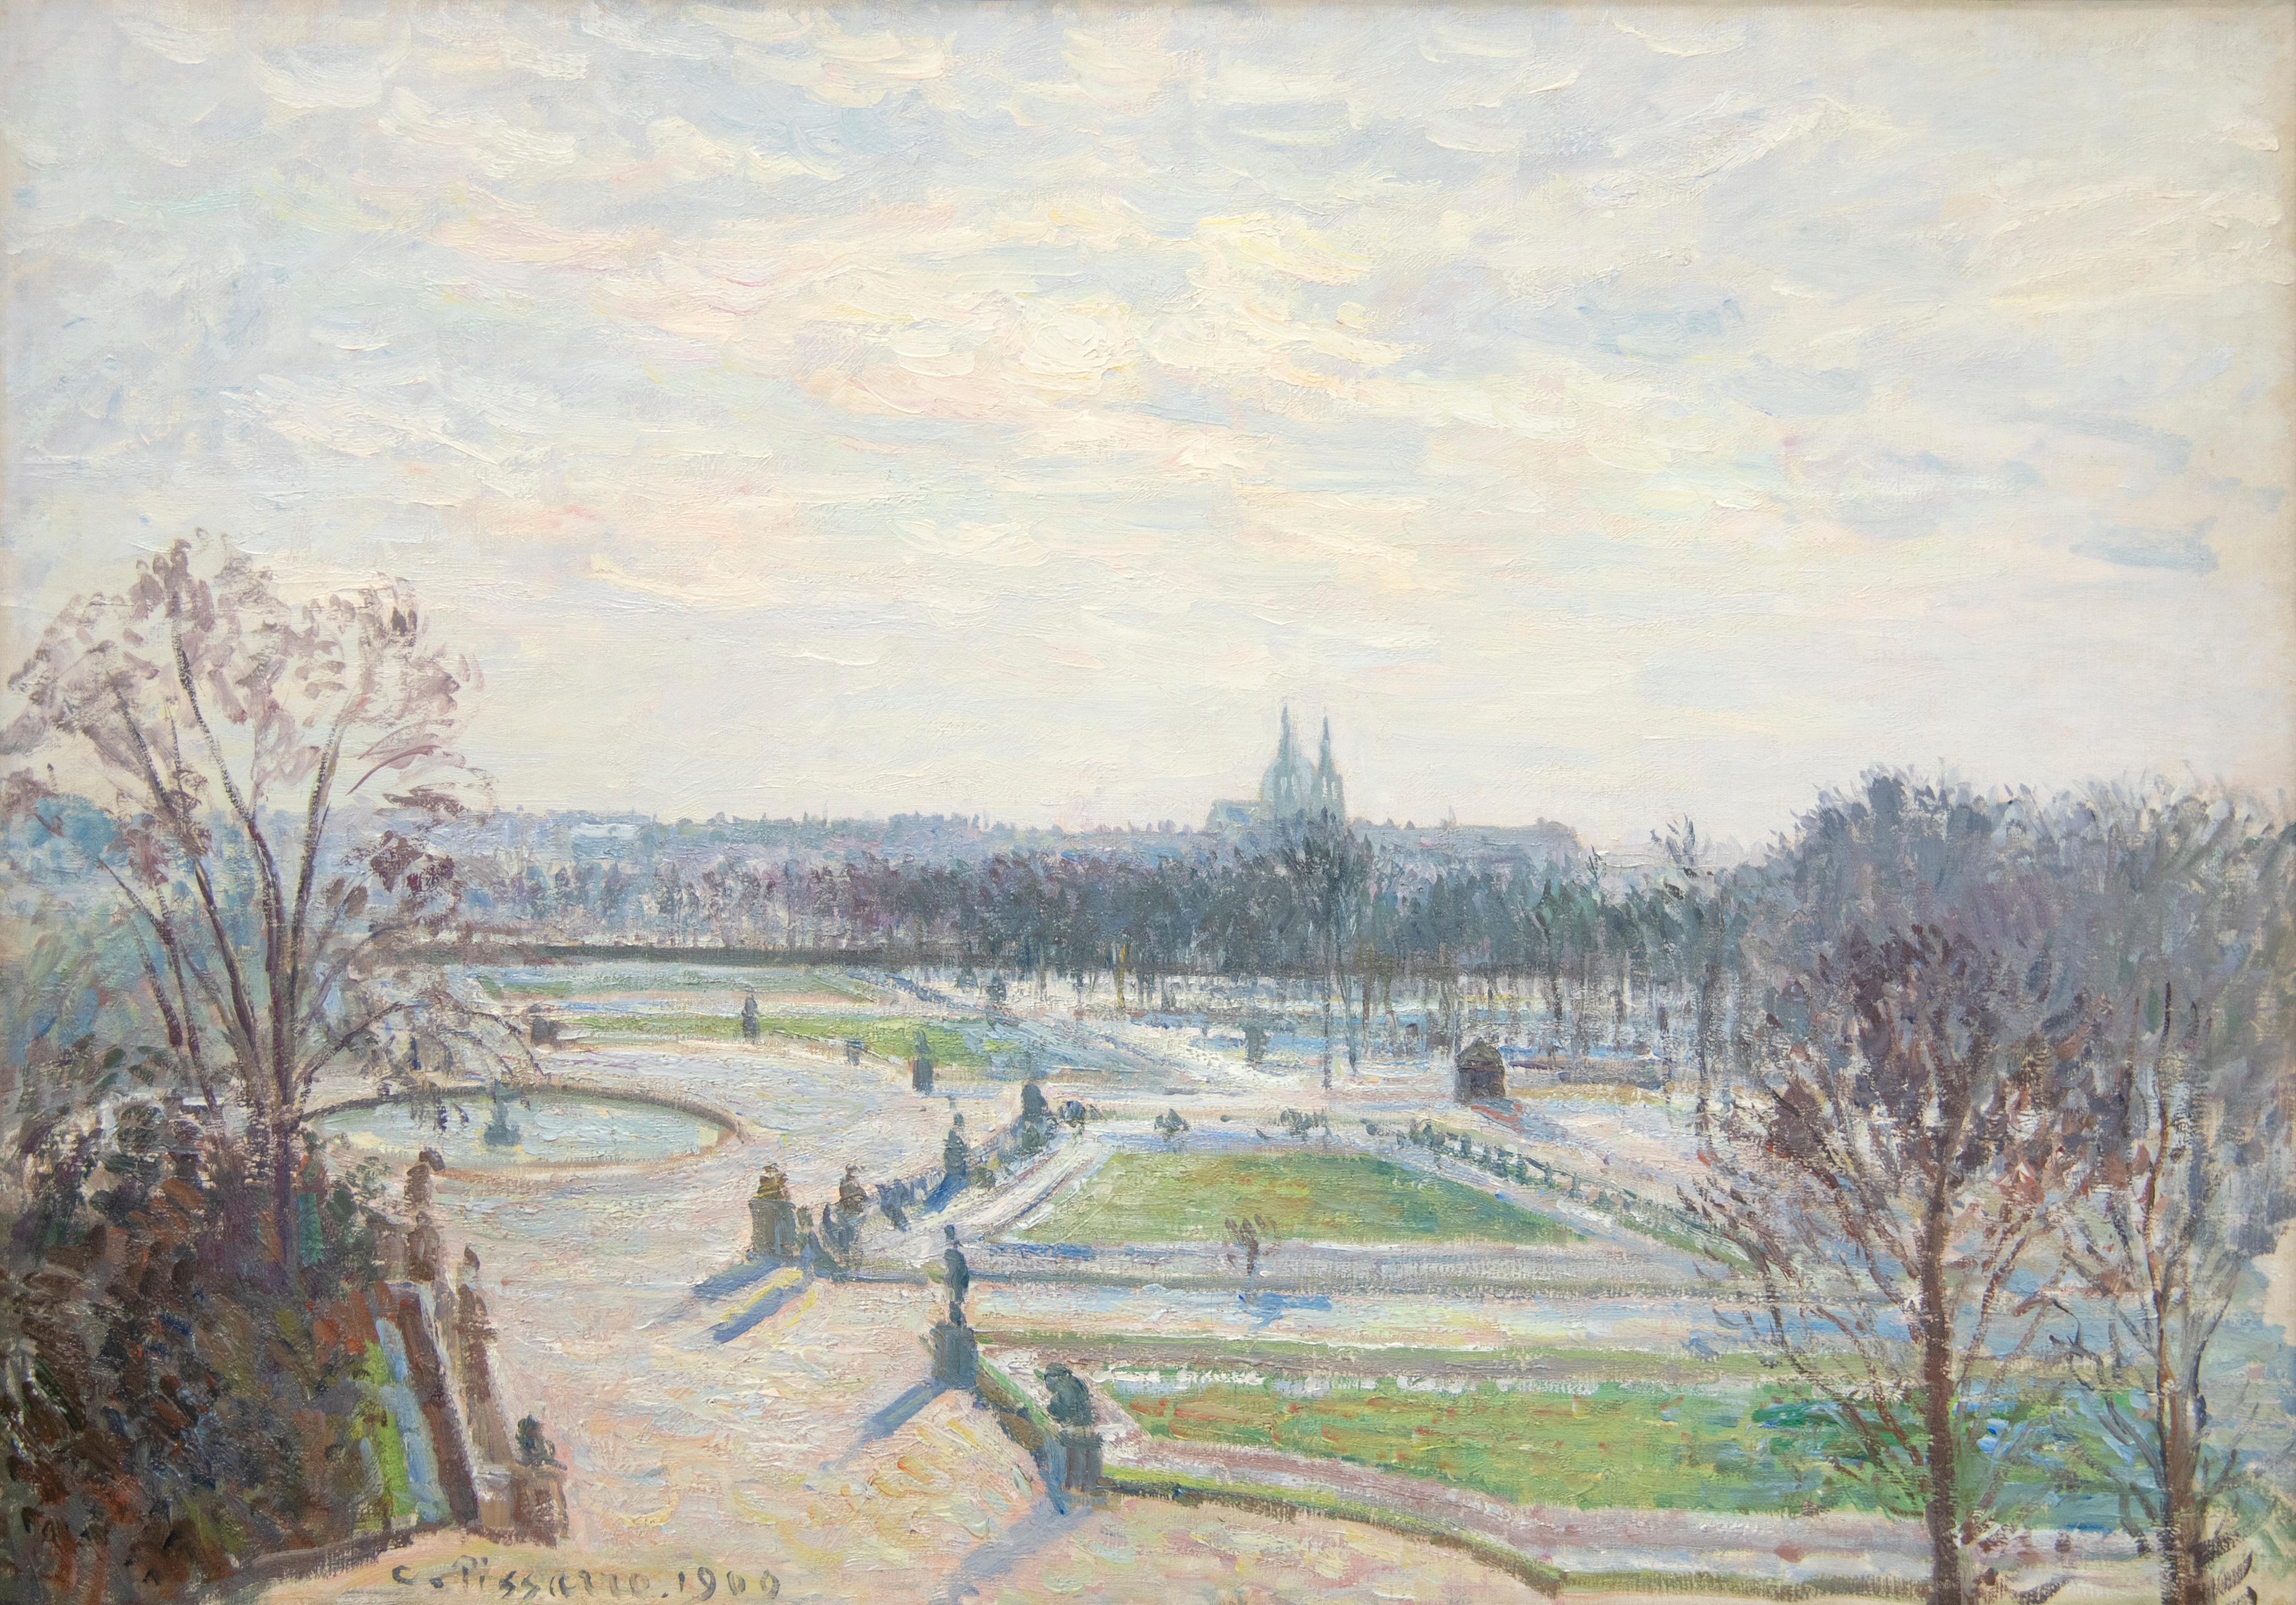 Le Jardin des Tuileries, Apres-Midi, Soleil